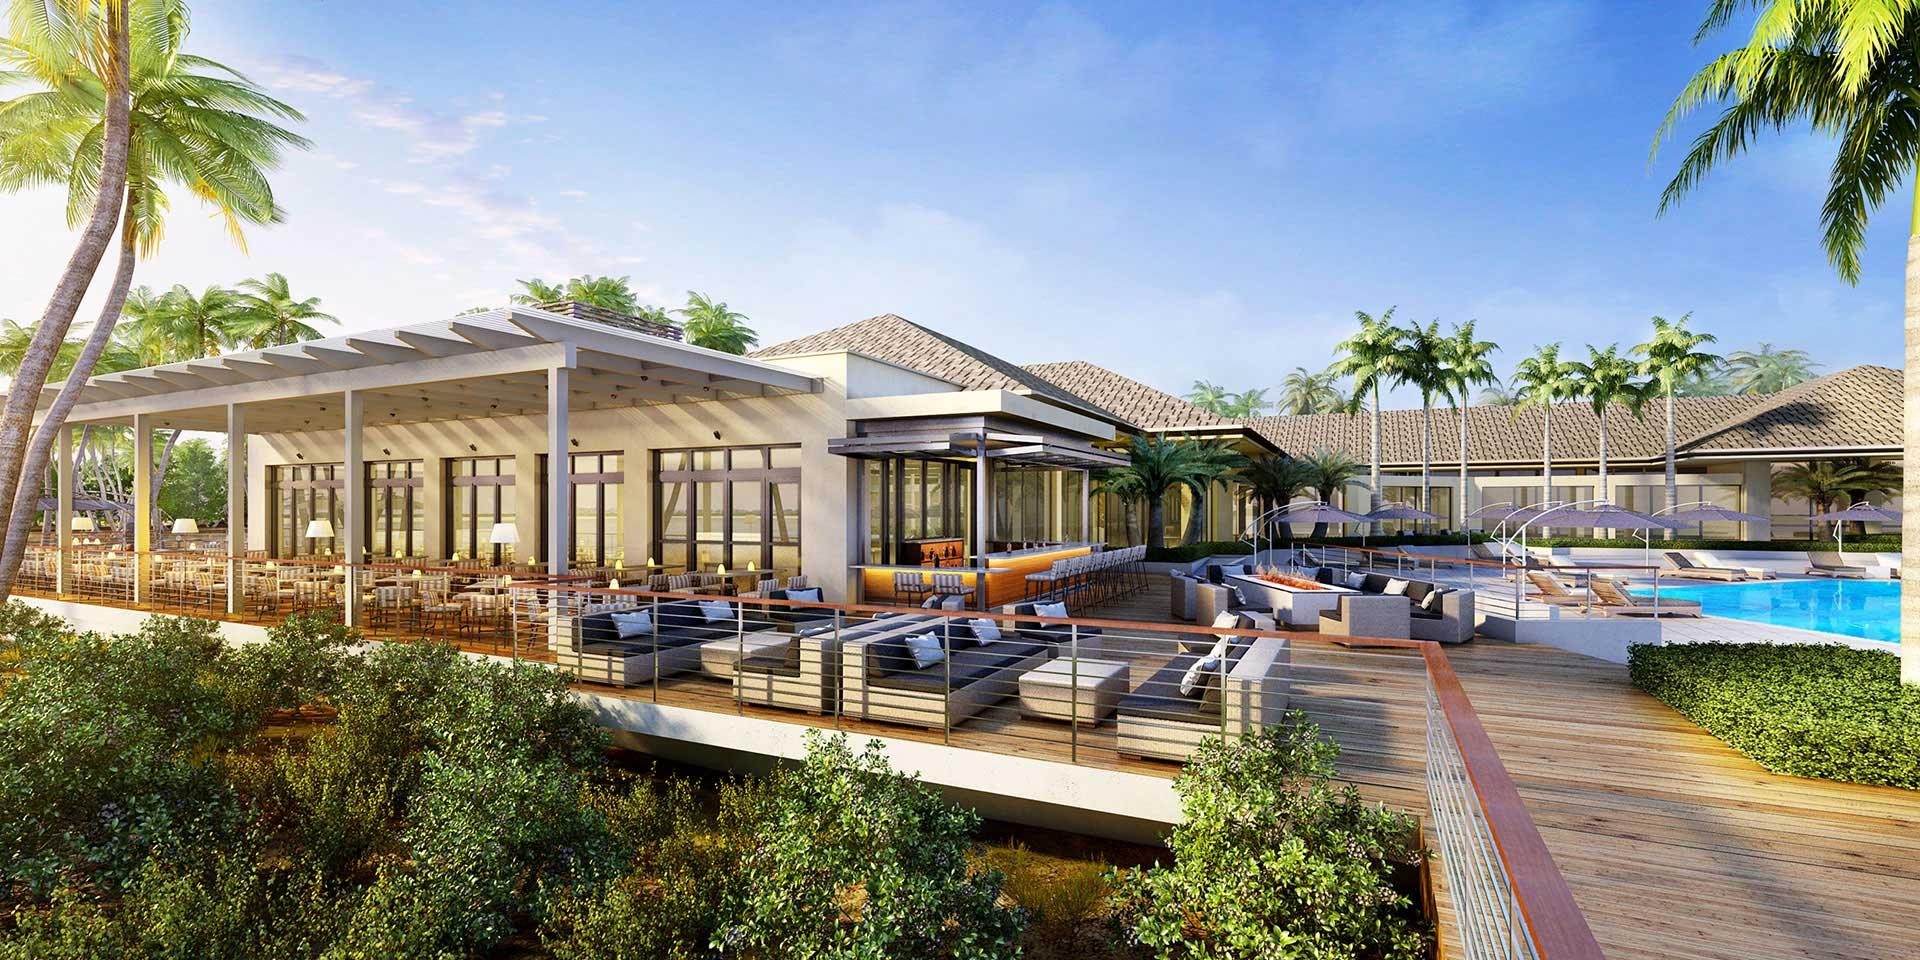 Renovation Phase 2 at the Hilton on Marco Island   Hilton Marco Island c4fdd71f54